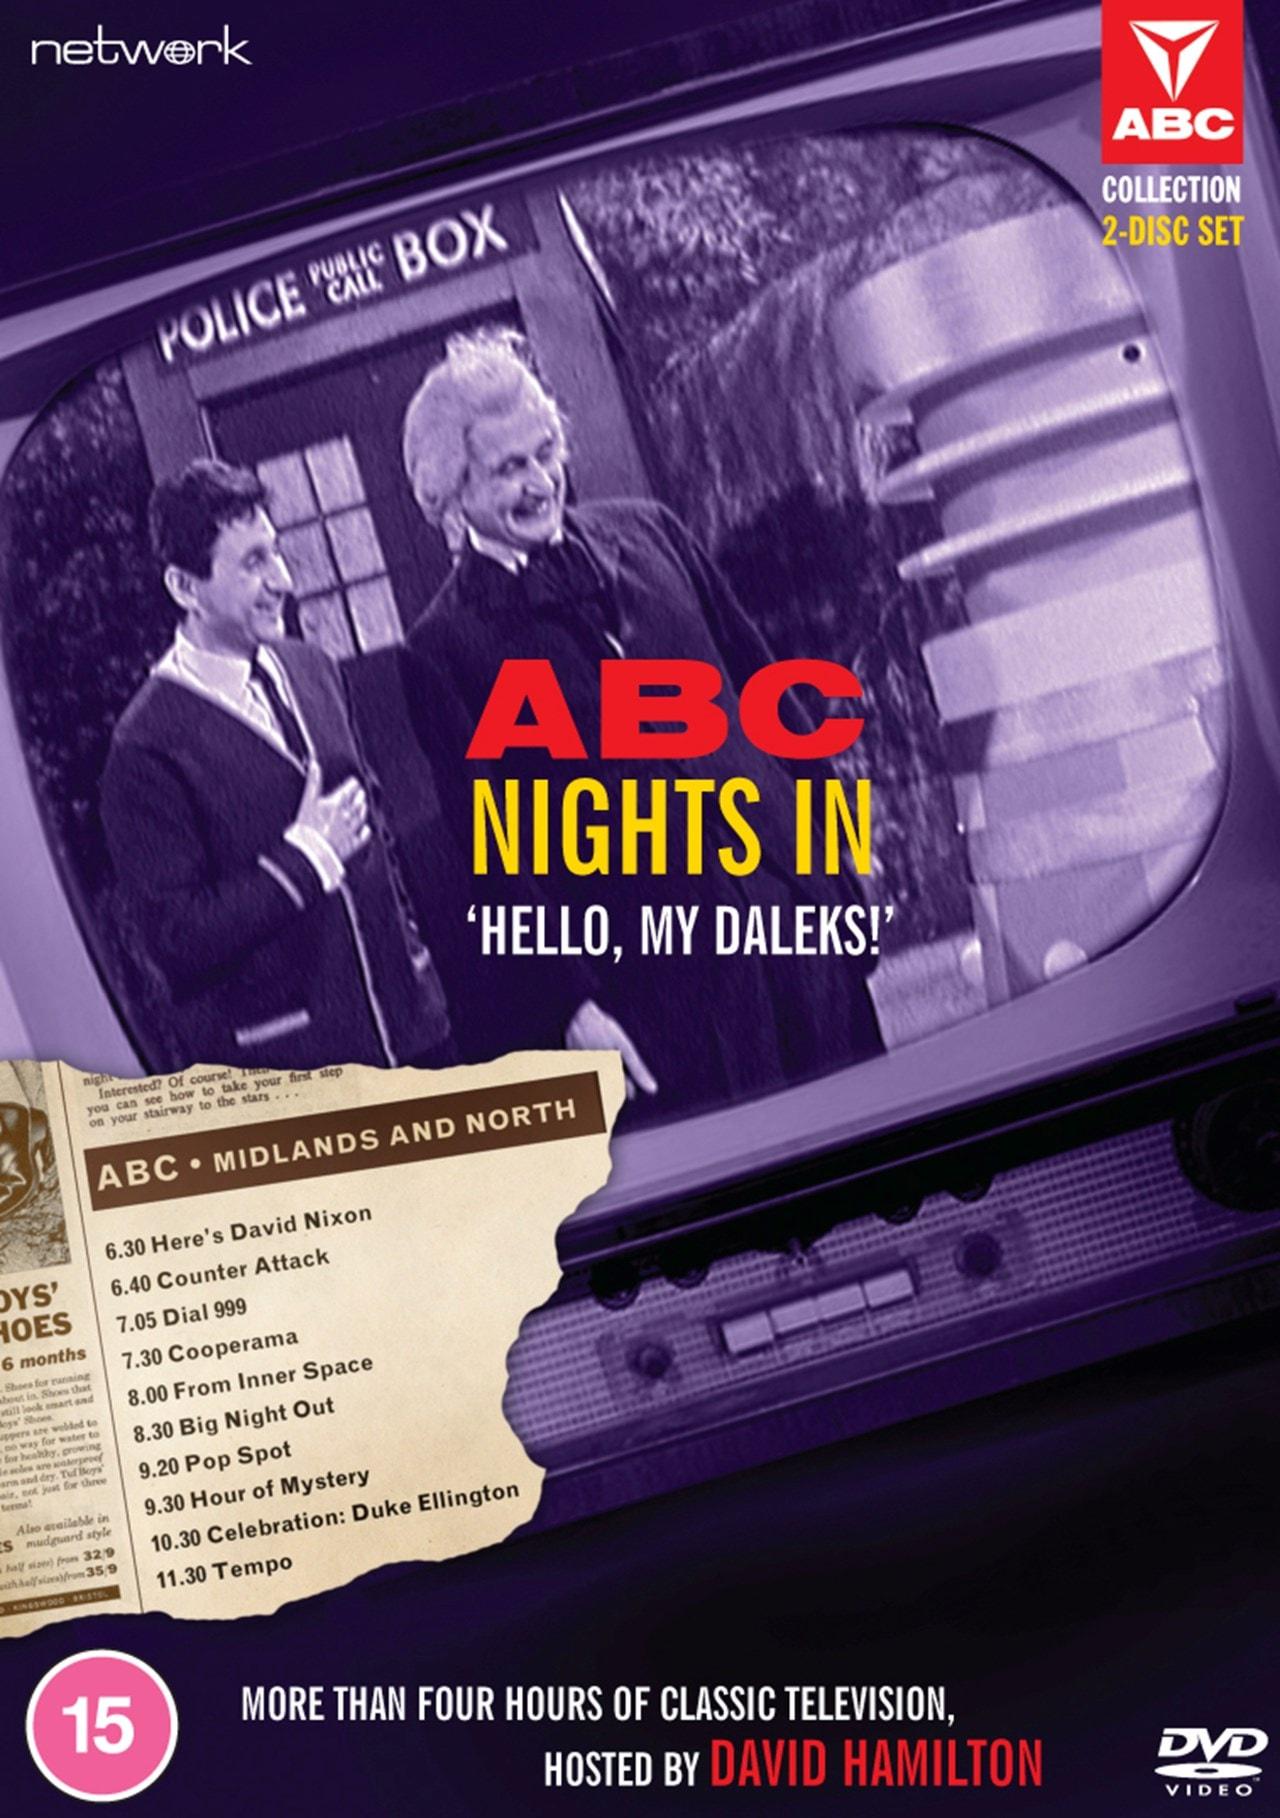 ABC Nights In: Hello, My Daleks! - 1